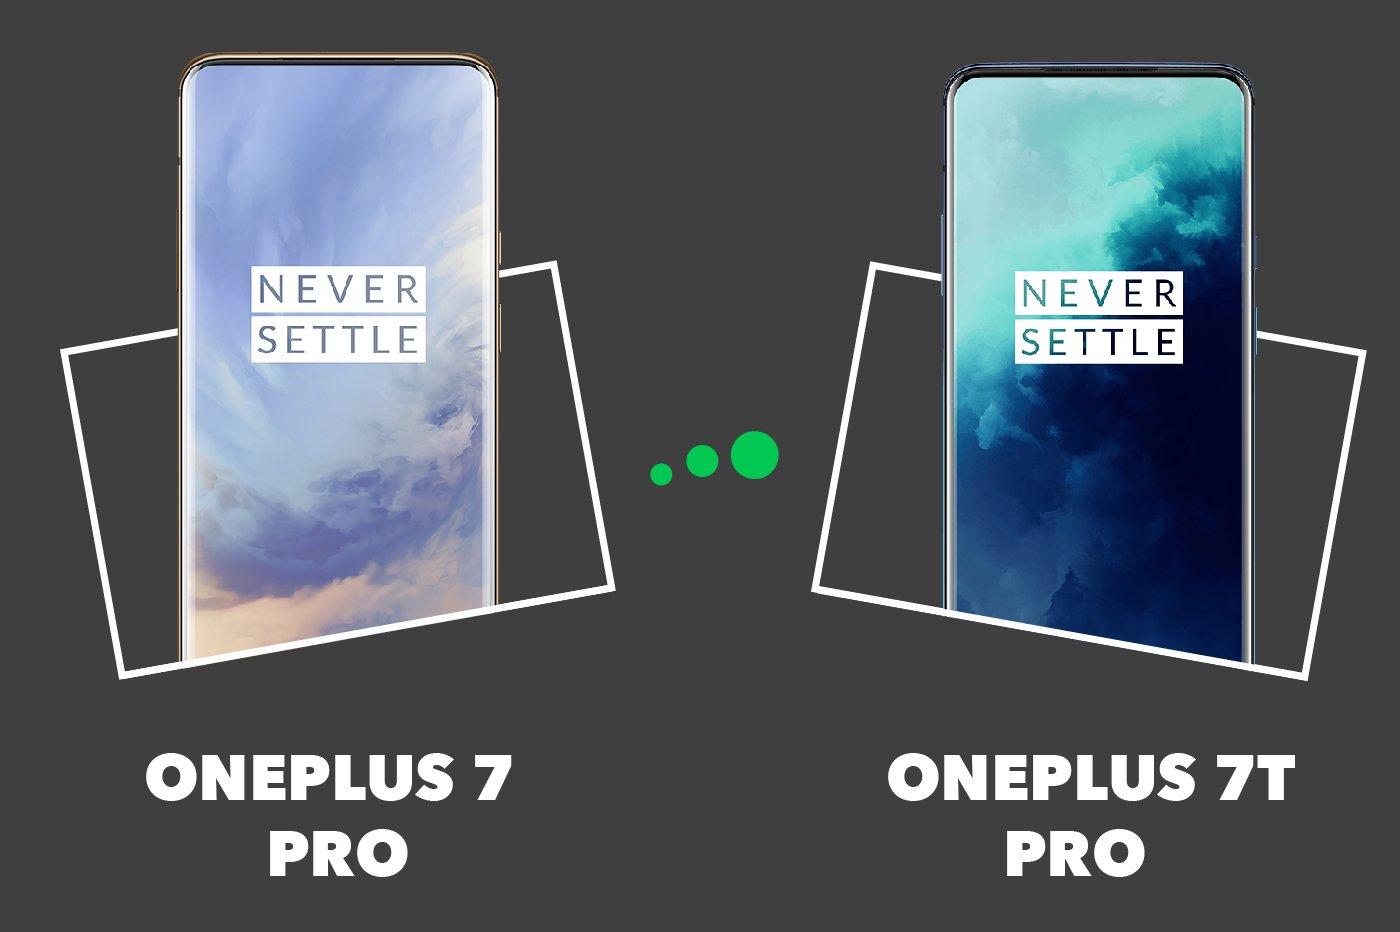 OnePlus 7T Pro vs OnePlus 7 Pro